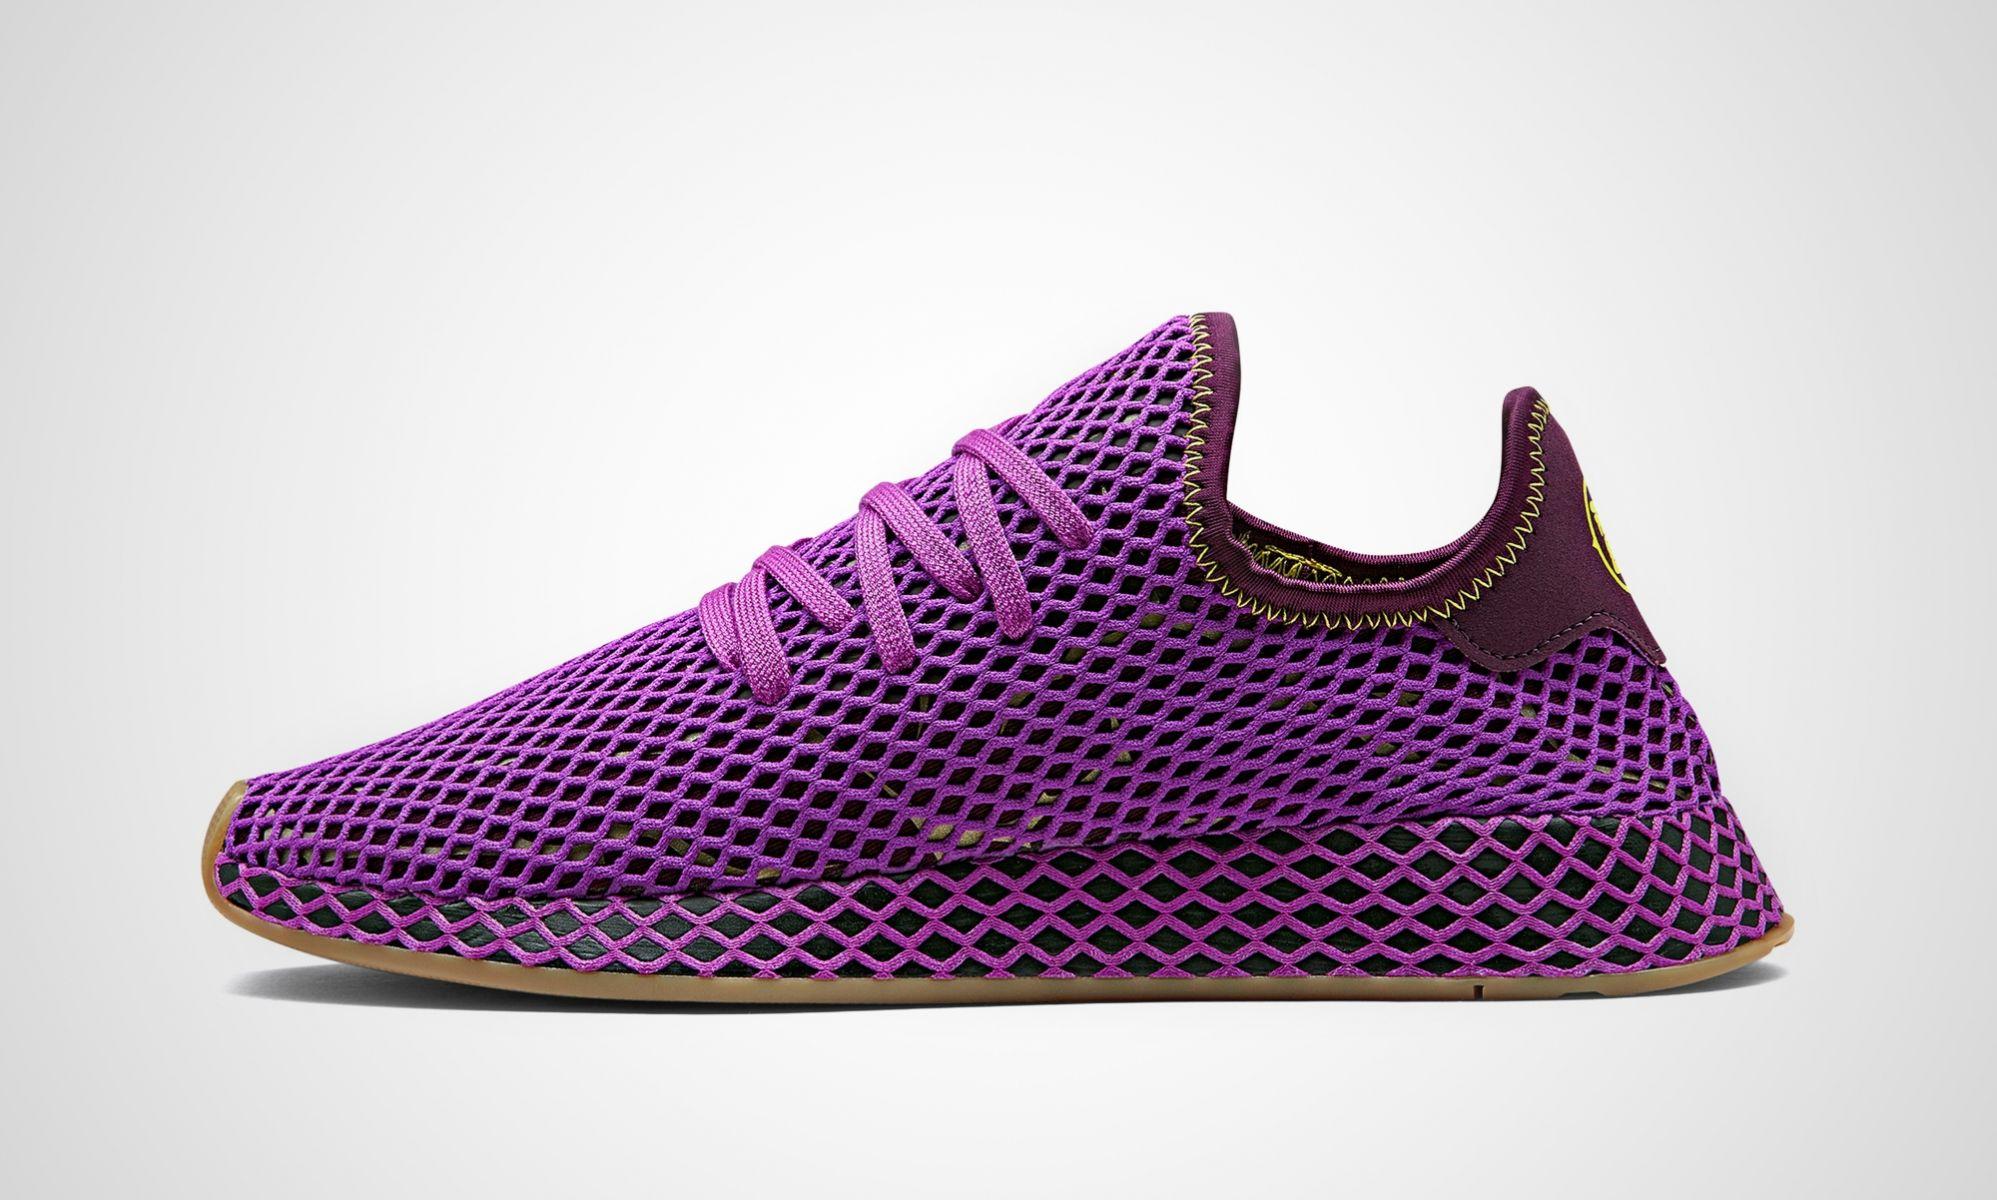 Sneakerblog Z Deerupt Son Stock Dragonball Pack GohanDead Adidas Pn0k8Ow